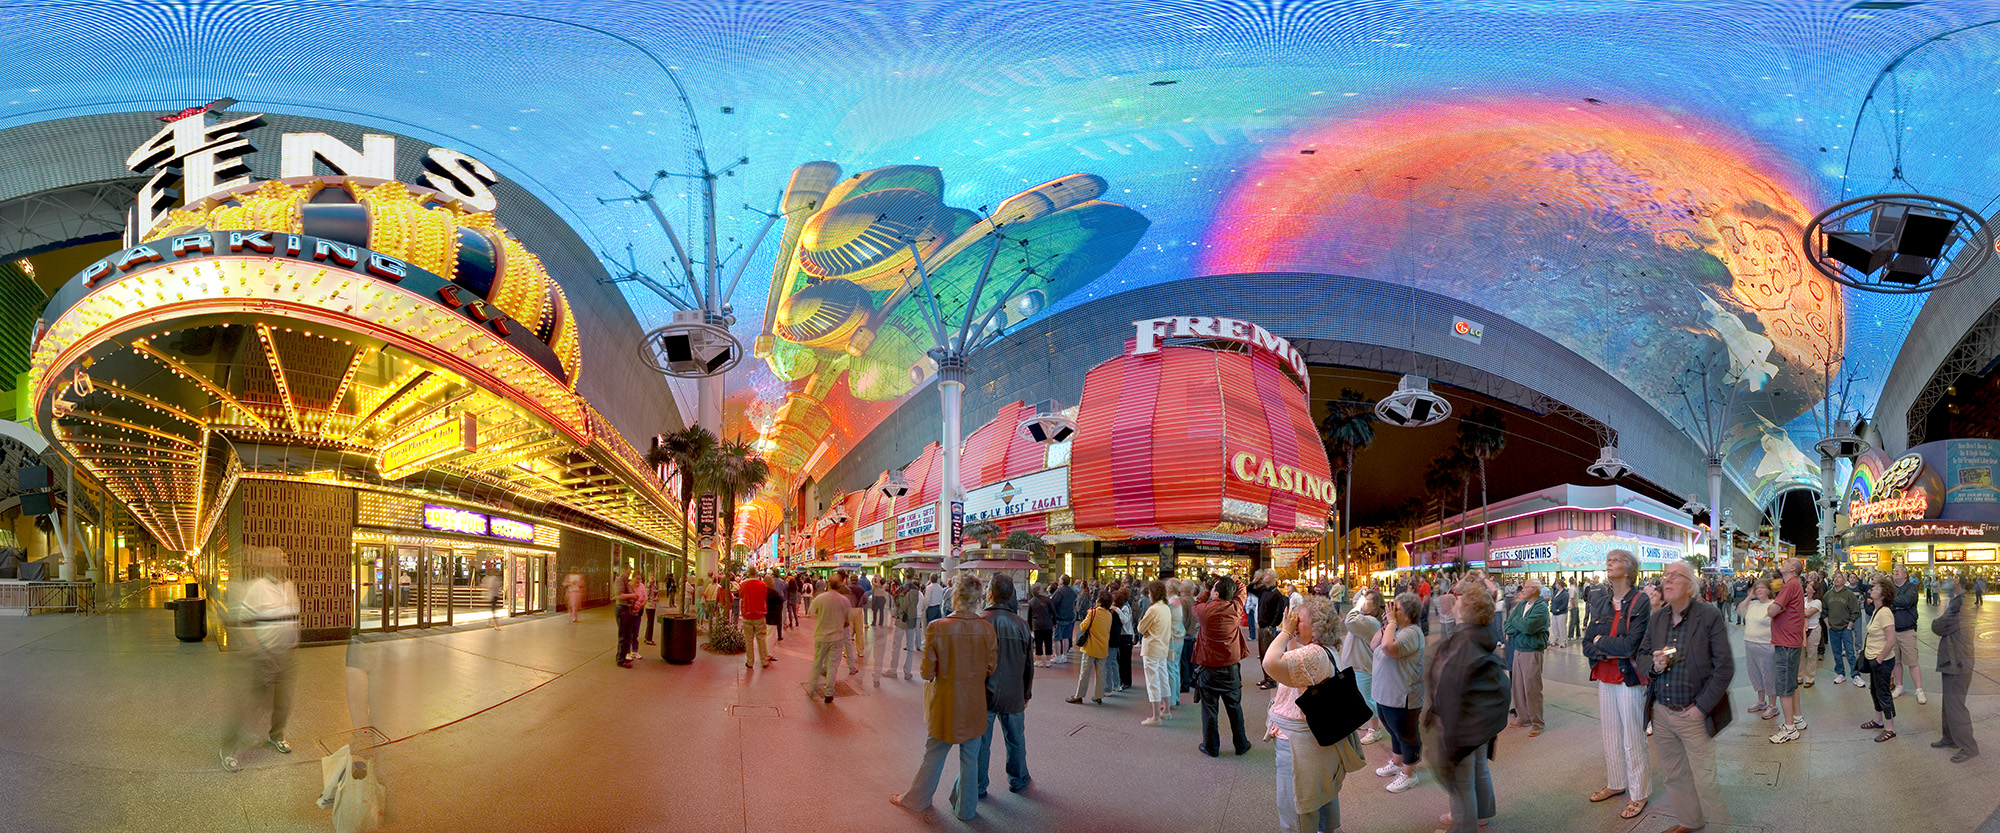 Las Vegas, Nevada, 2010